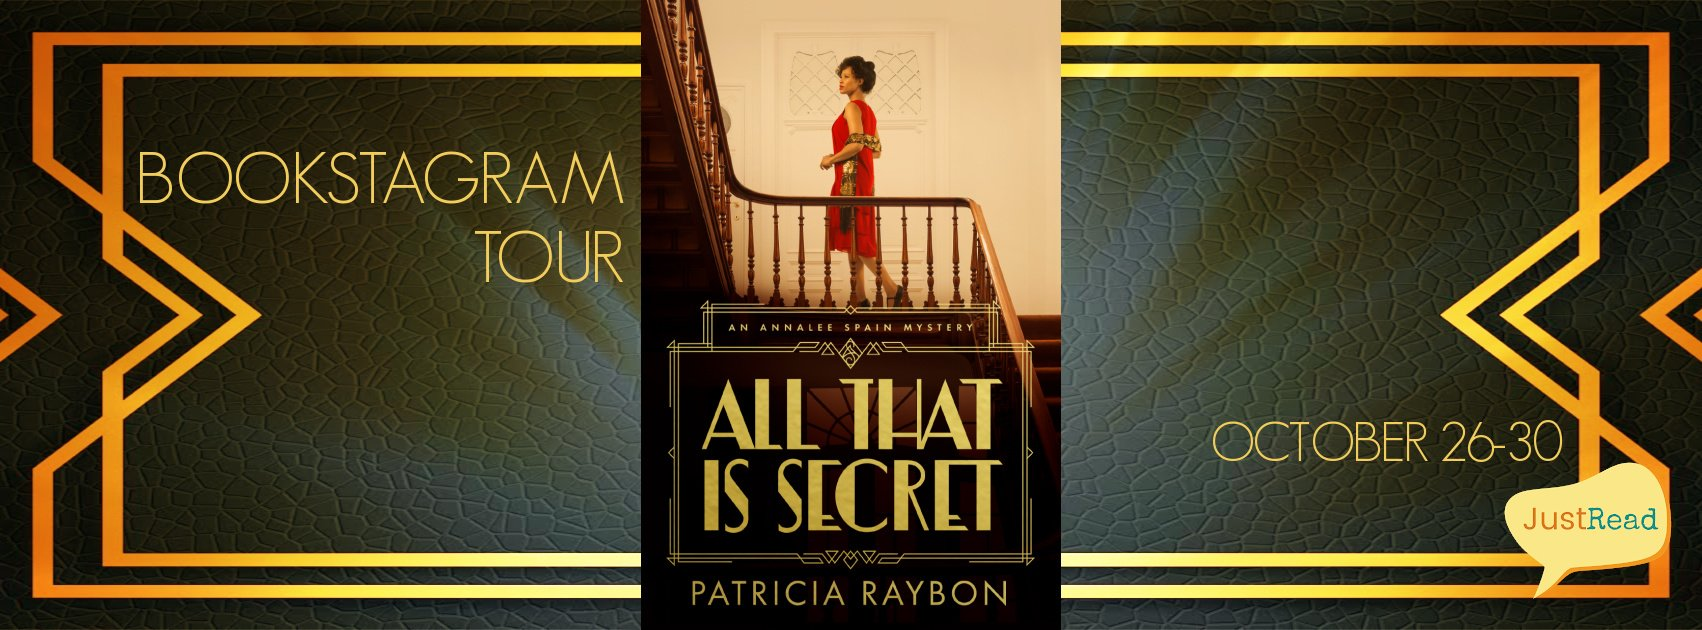 All That is Secret JustRead Bookstagram Tour